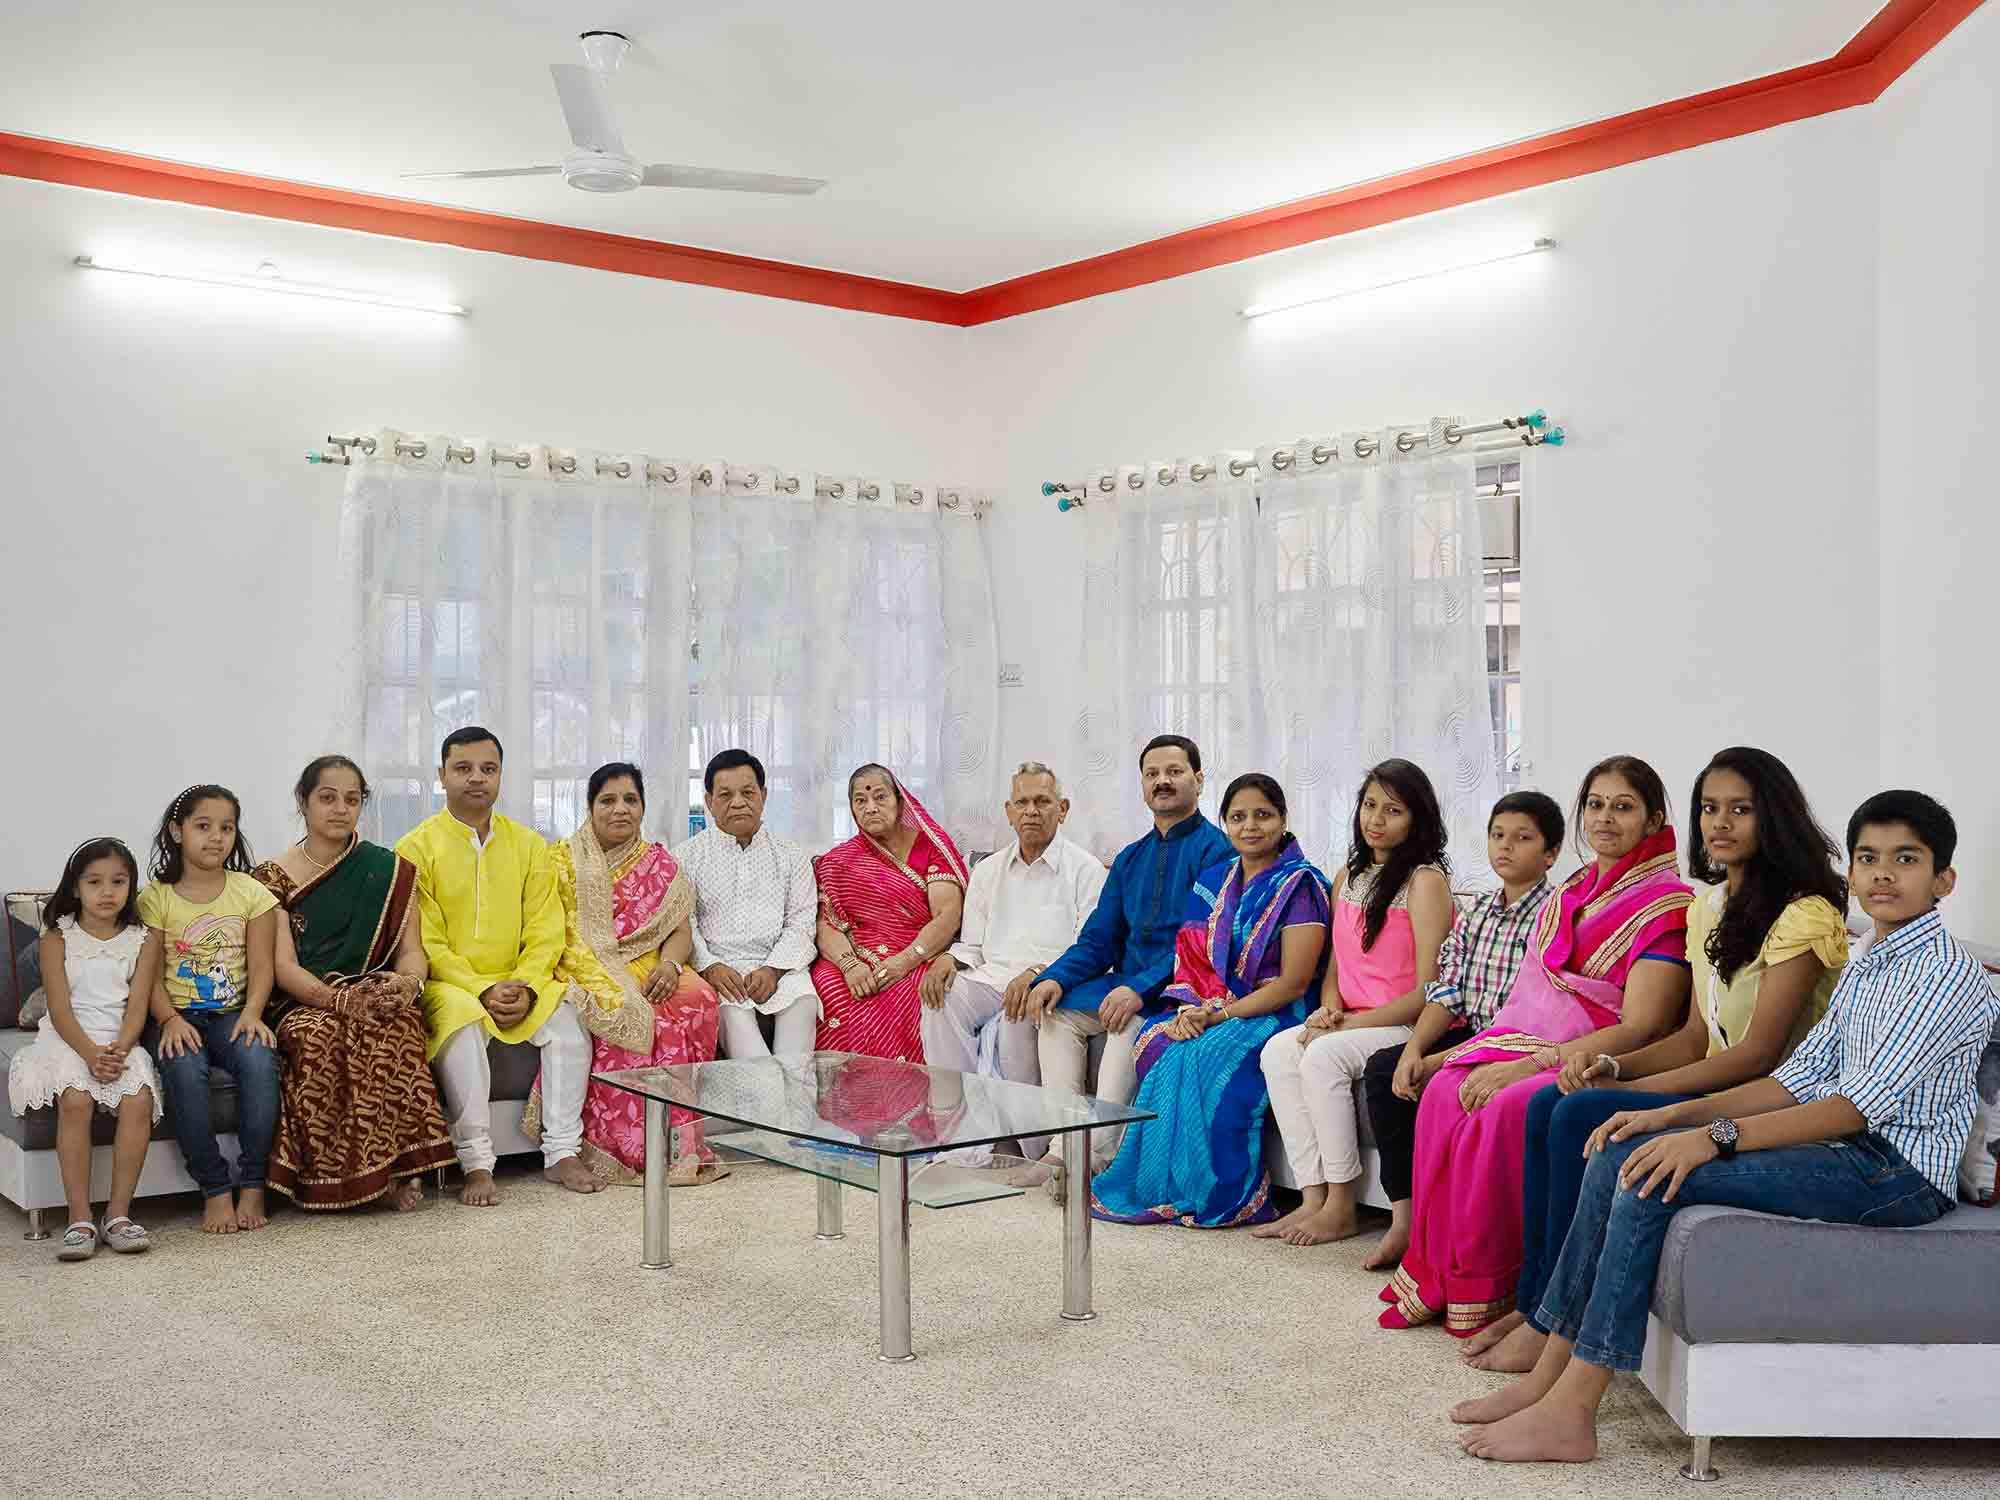 Nora Bibel, Mehta, Bangalore, Indien, 2015. Aus der Serie Family Comes First